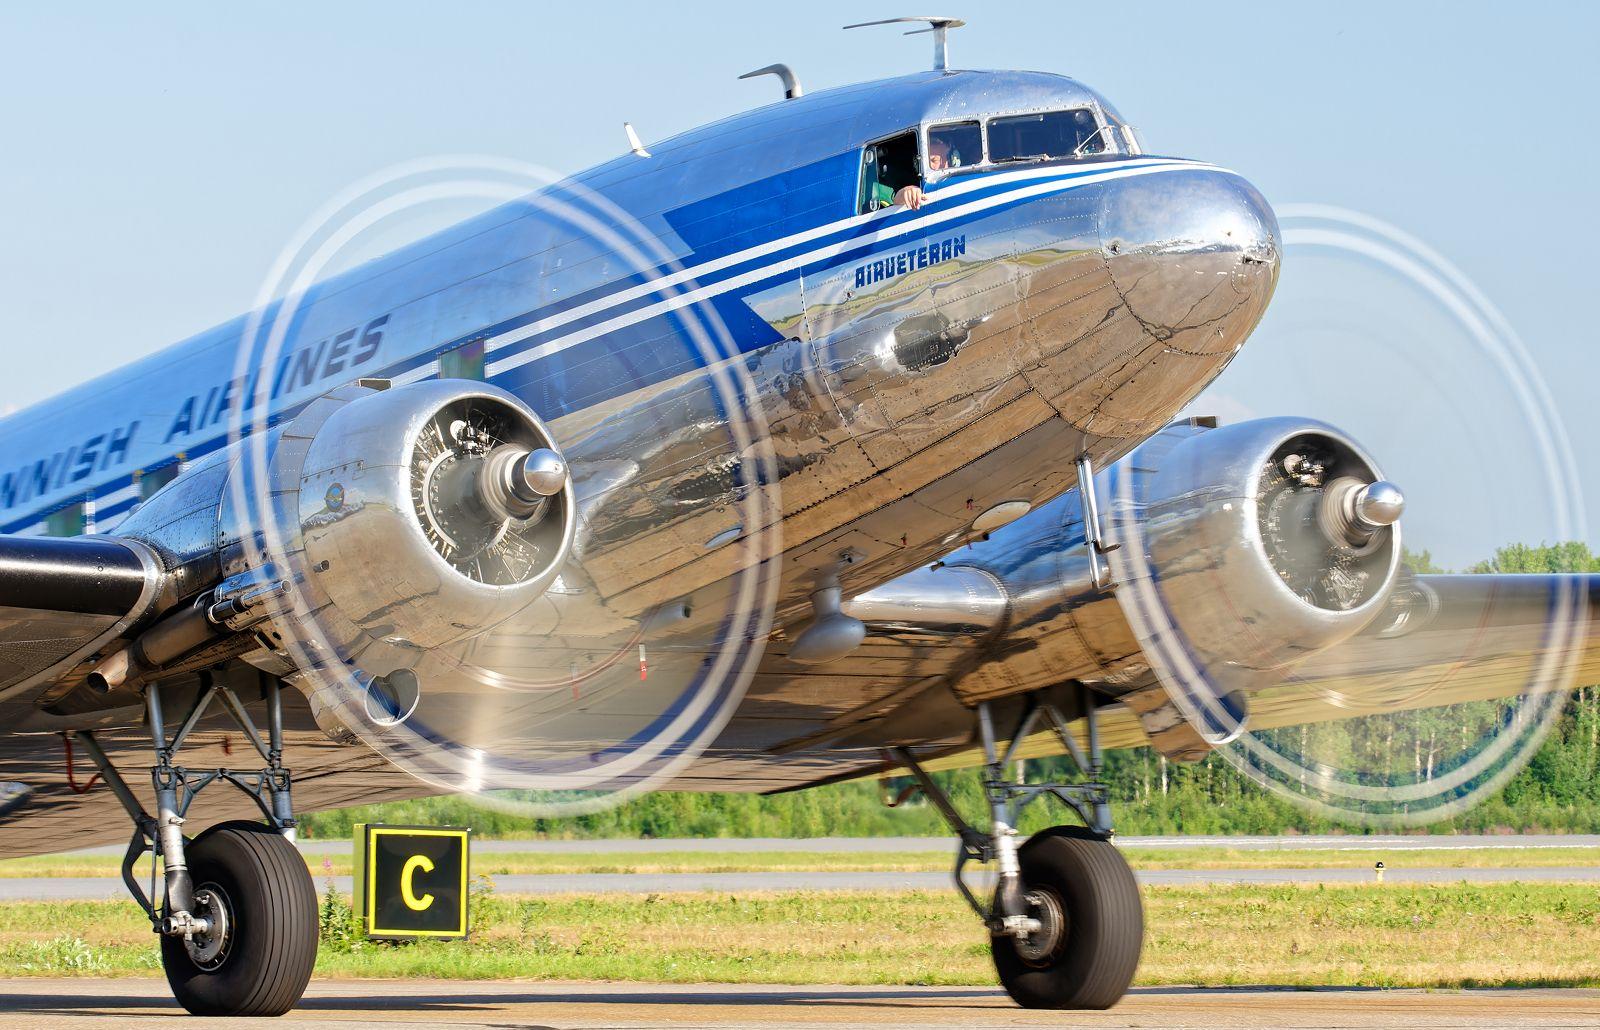 OH-LCH - Douglas DC-3 (C-53C Skytrooper) - Airveteran - 14.7.2021